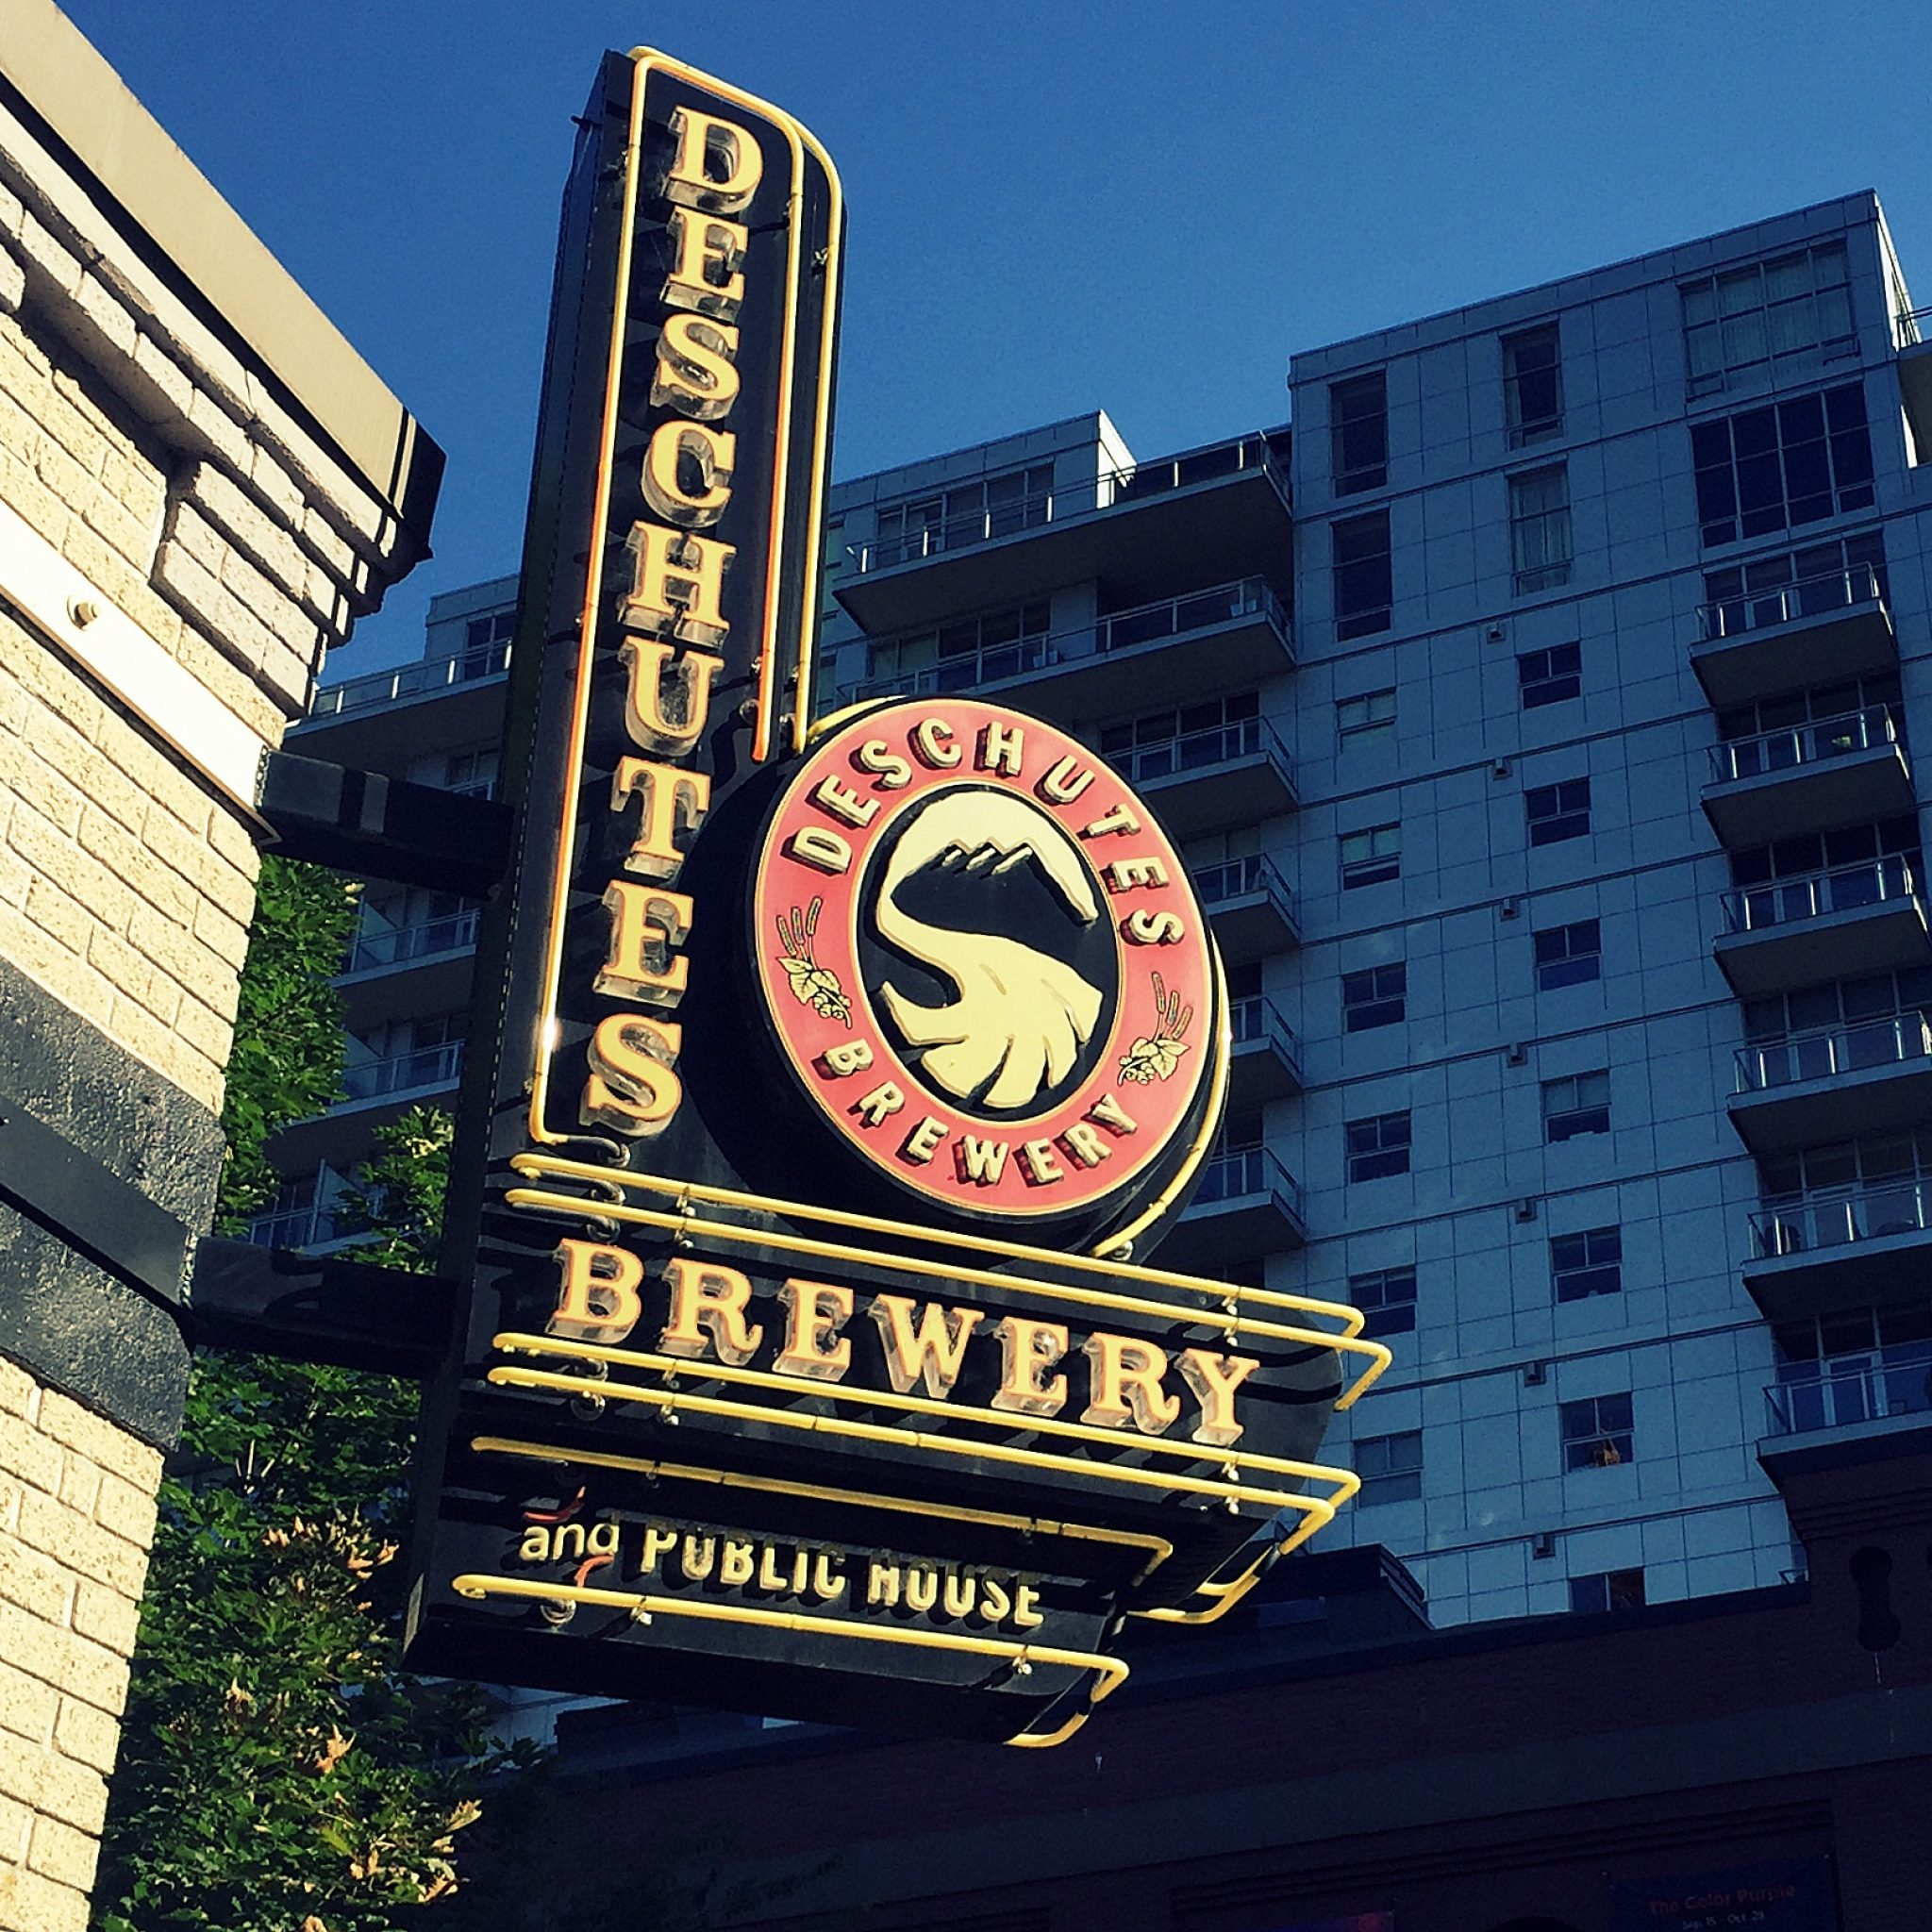 Many brewery restaurants offer food menus that go way beyond pretzels (although pretzels at Deschutes rock!).